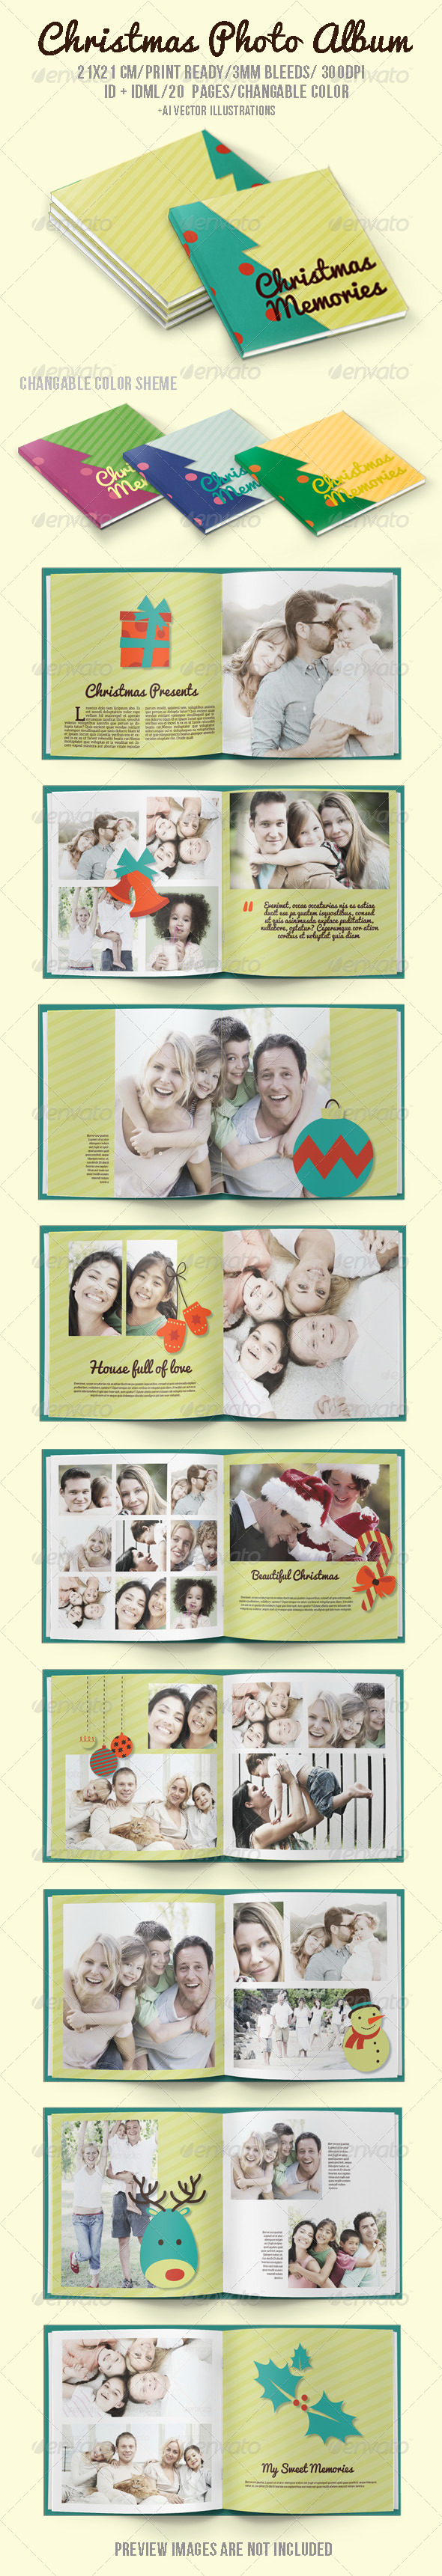 GraphicRiver Christmas Memories 6190226